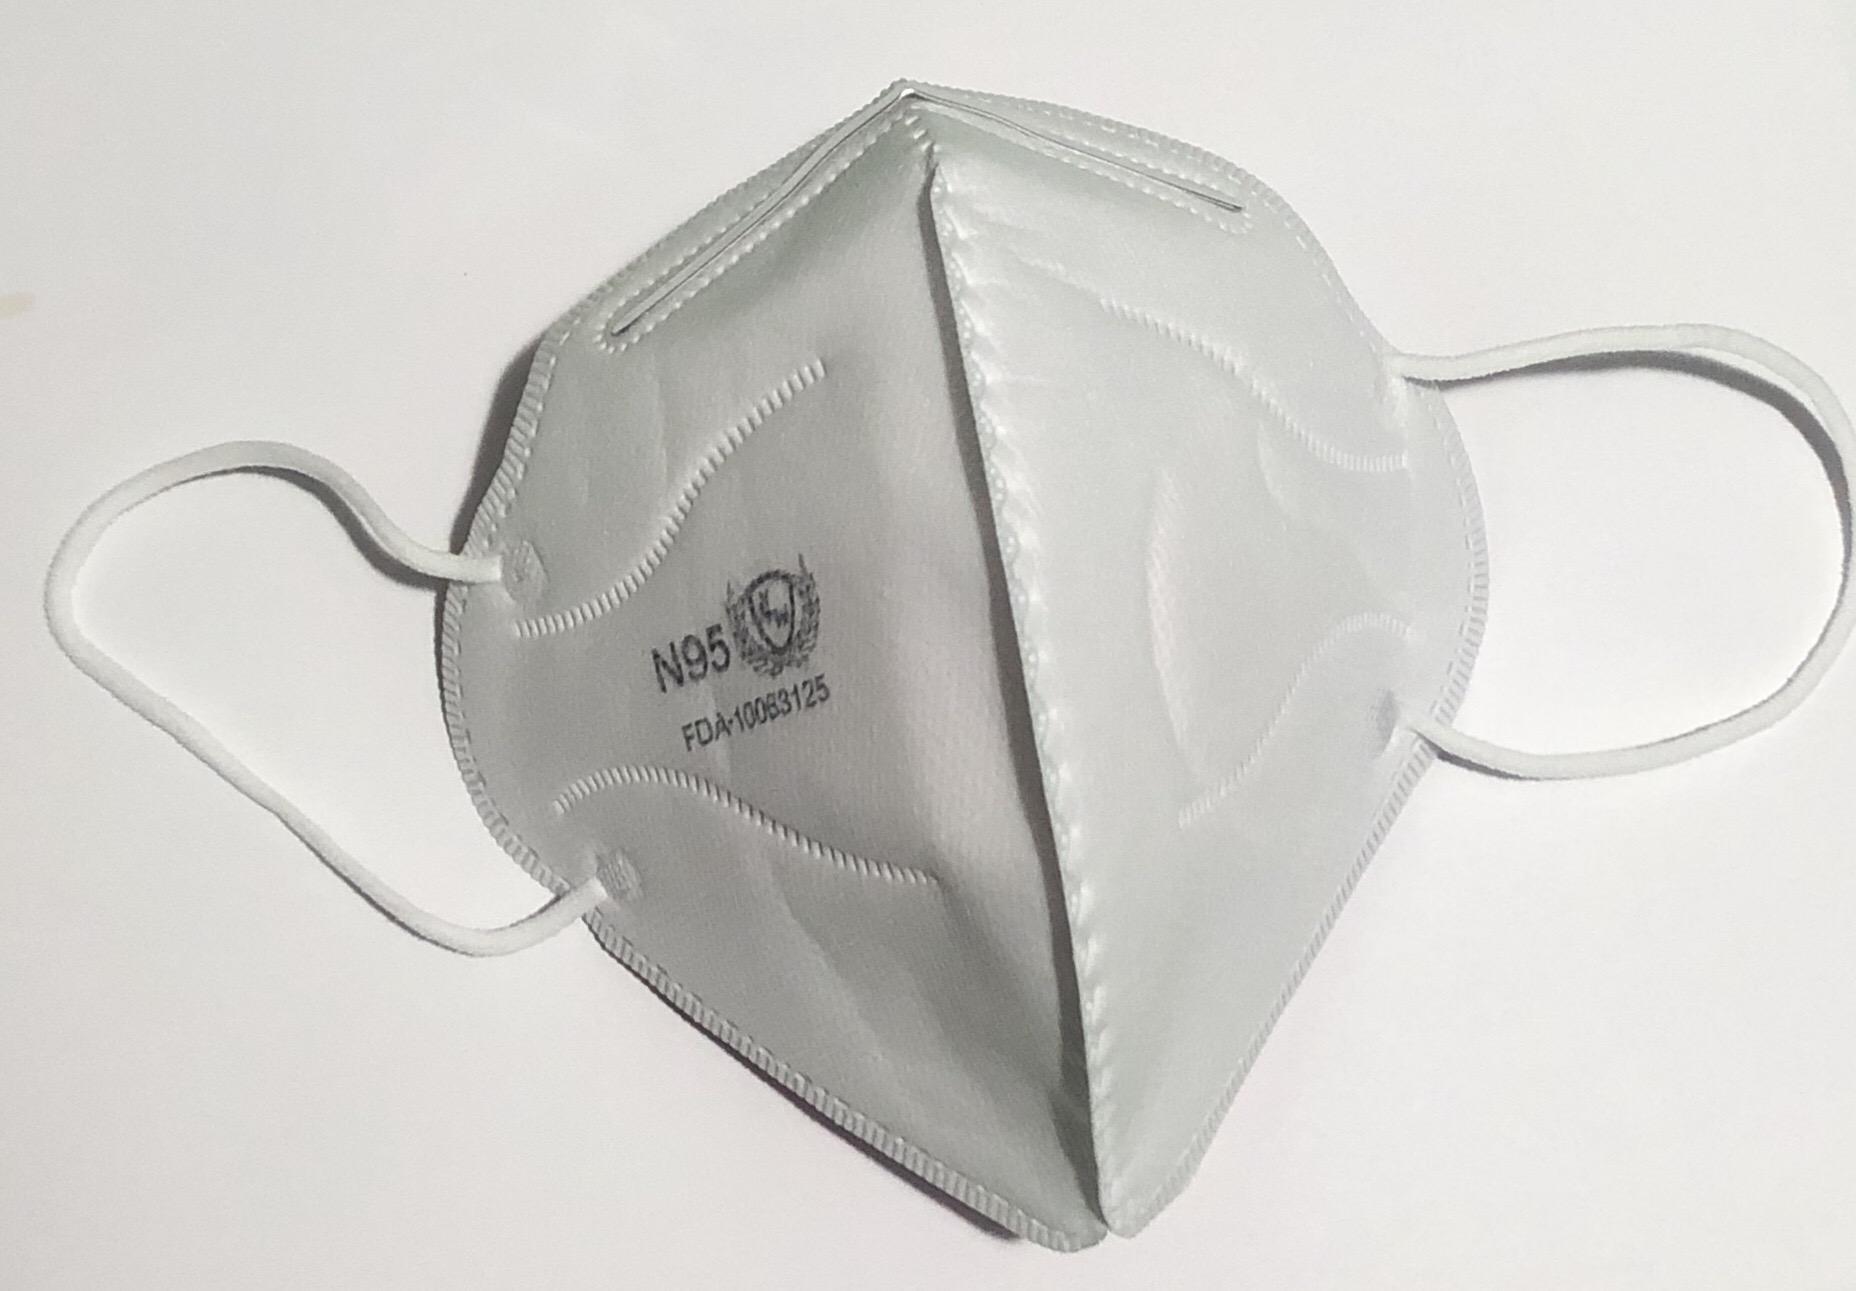 N95 non-medical face mask